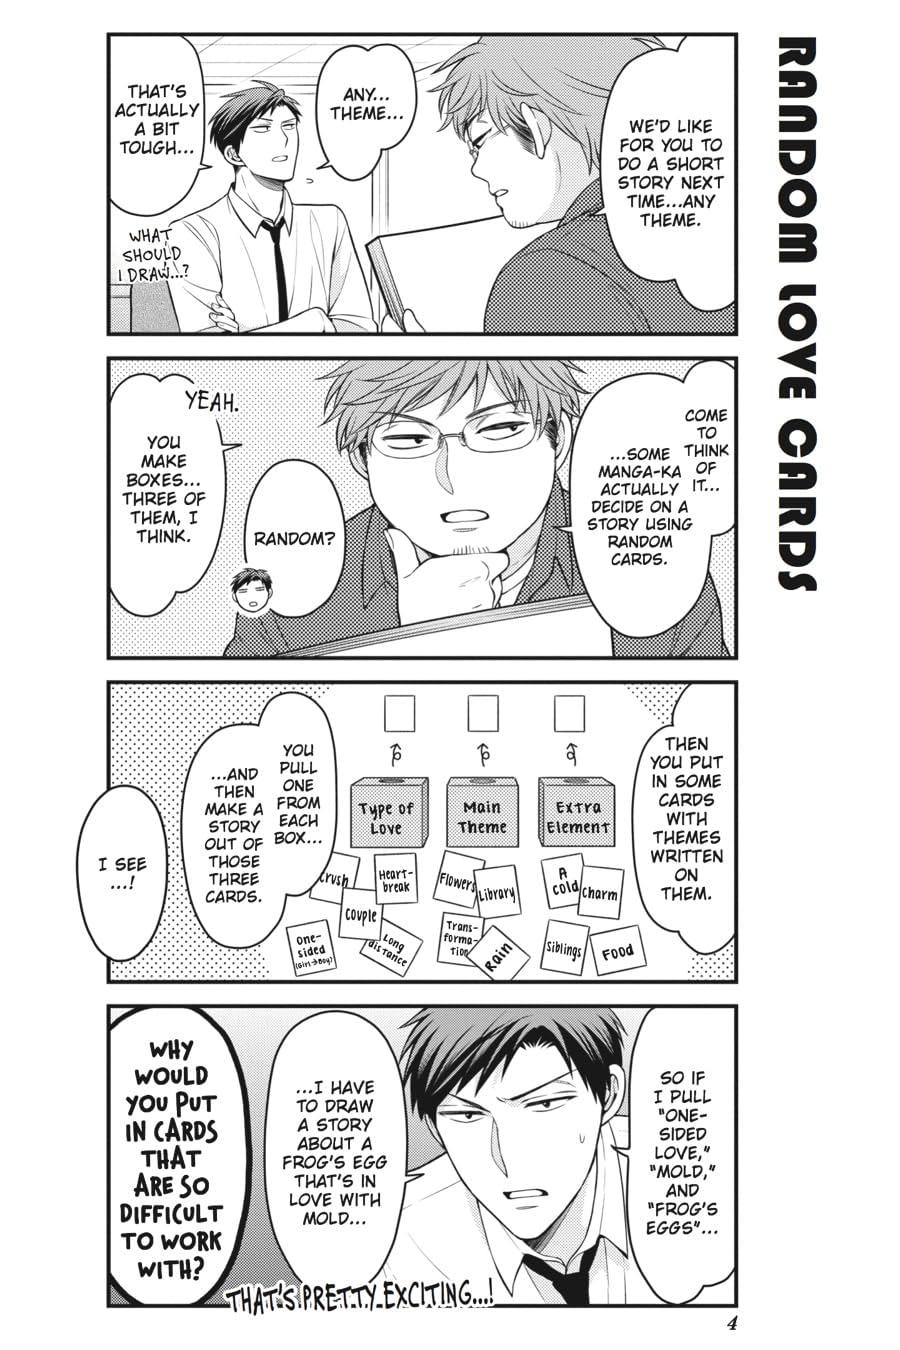 Monthly Girls' Nozaki-kun Vol. 8